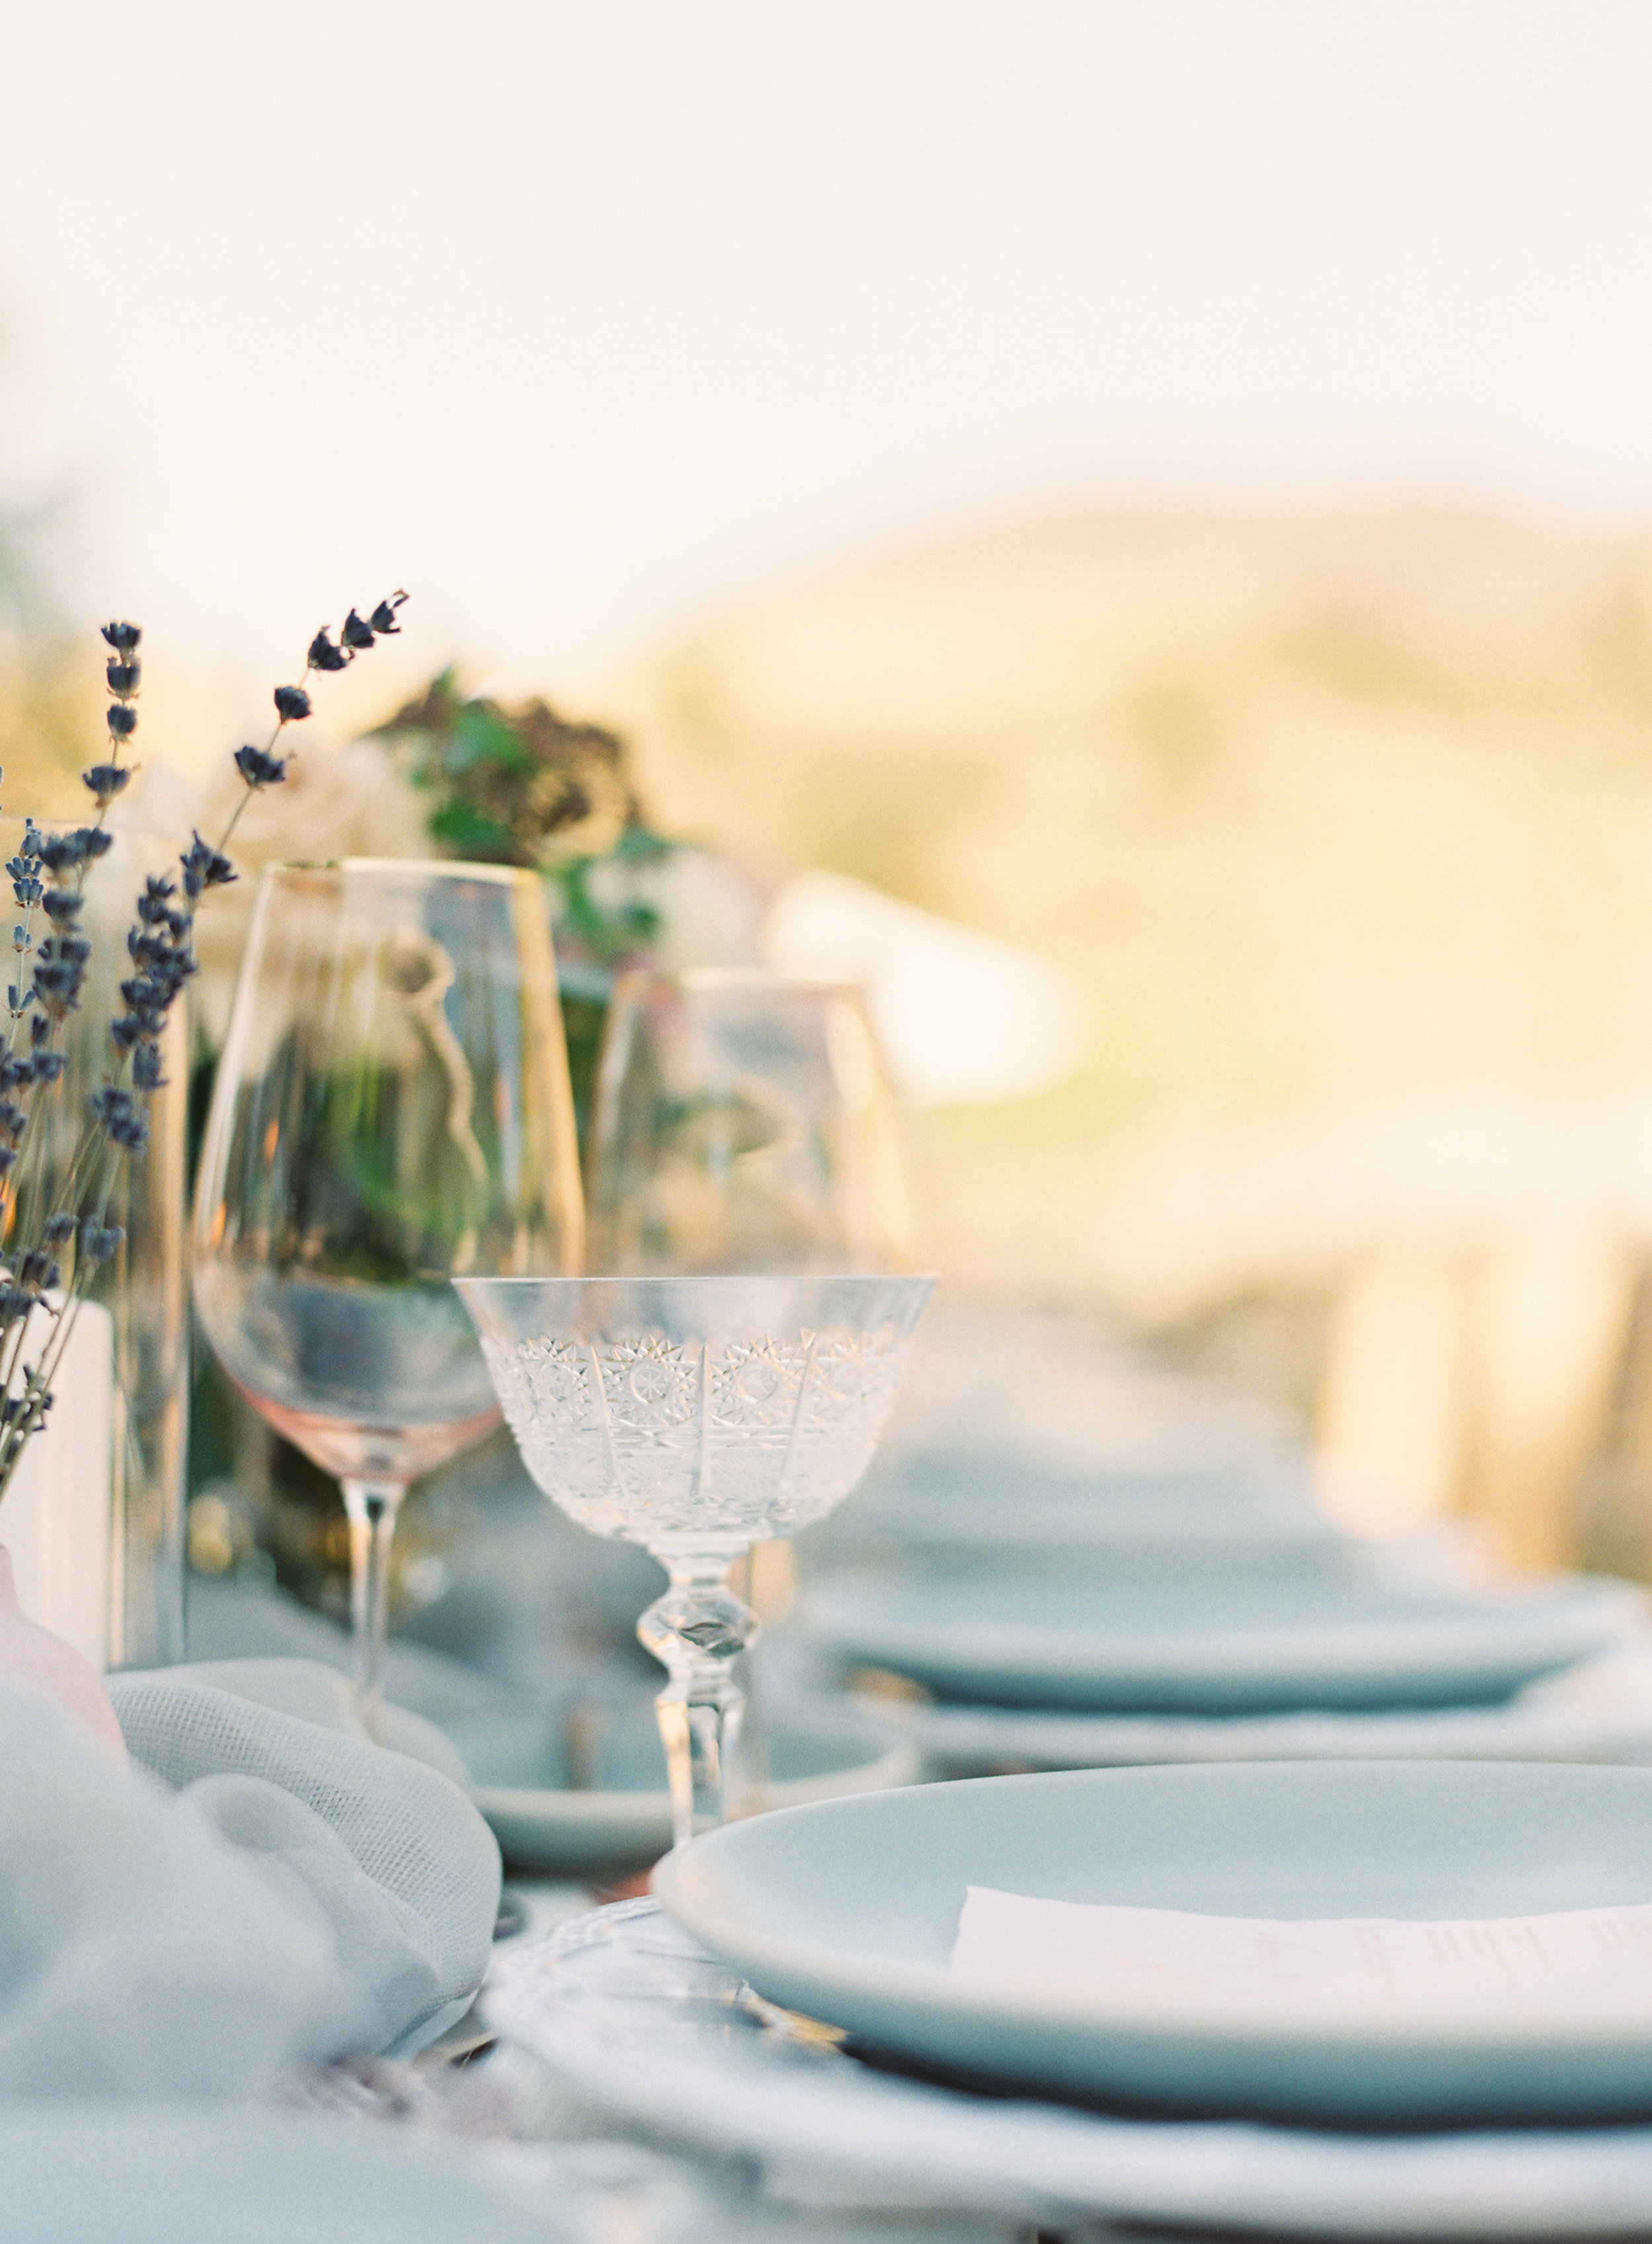 Triunfo_Creek_Winery_Wedding-210-Jen-Huang-JL-442-Jen-Huang-009972-R1-006.jpg